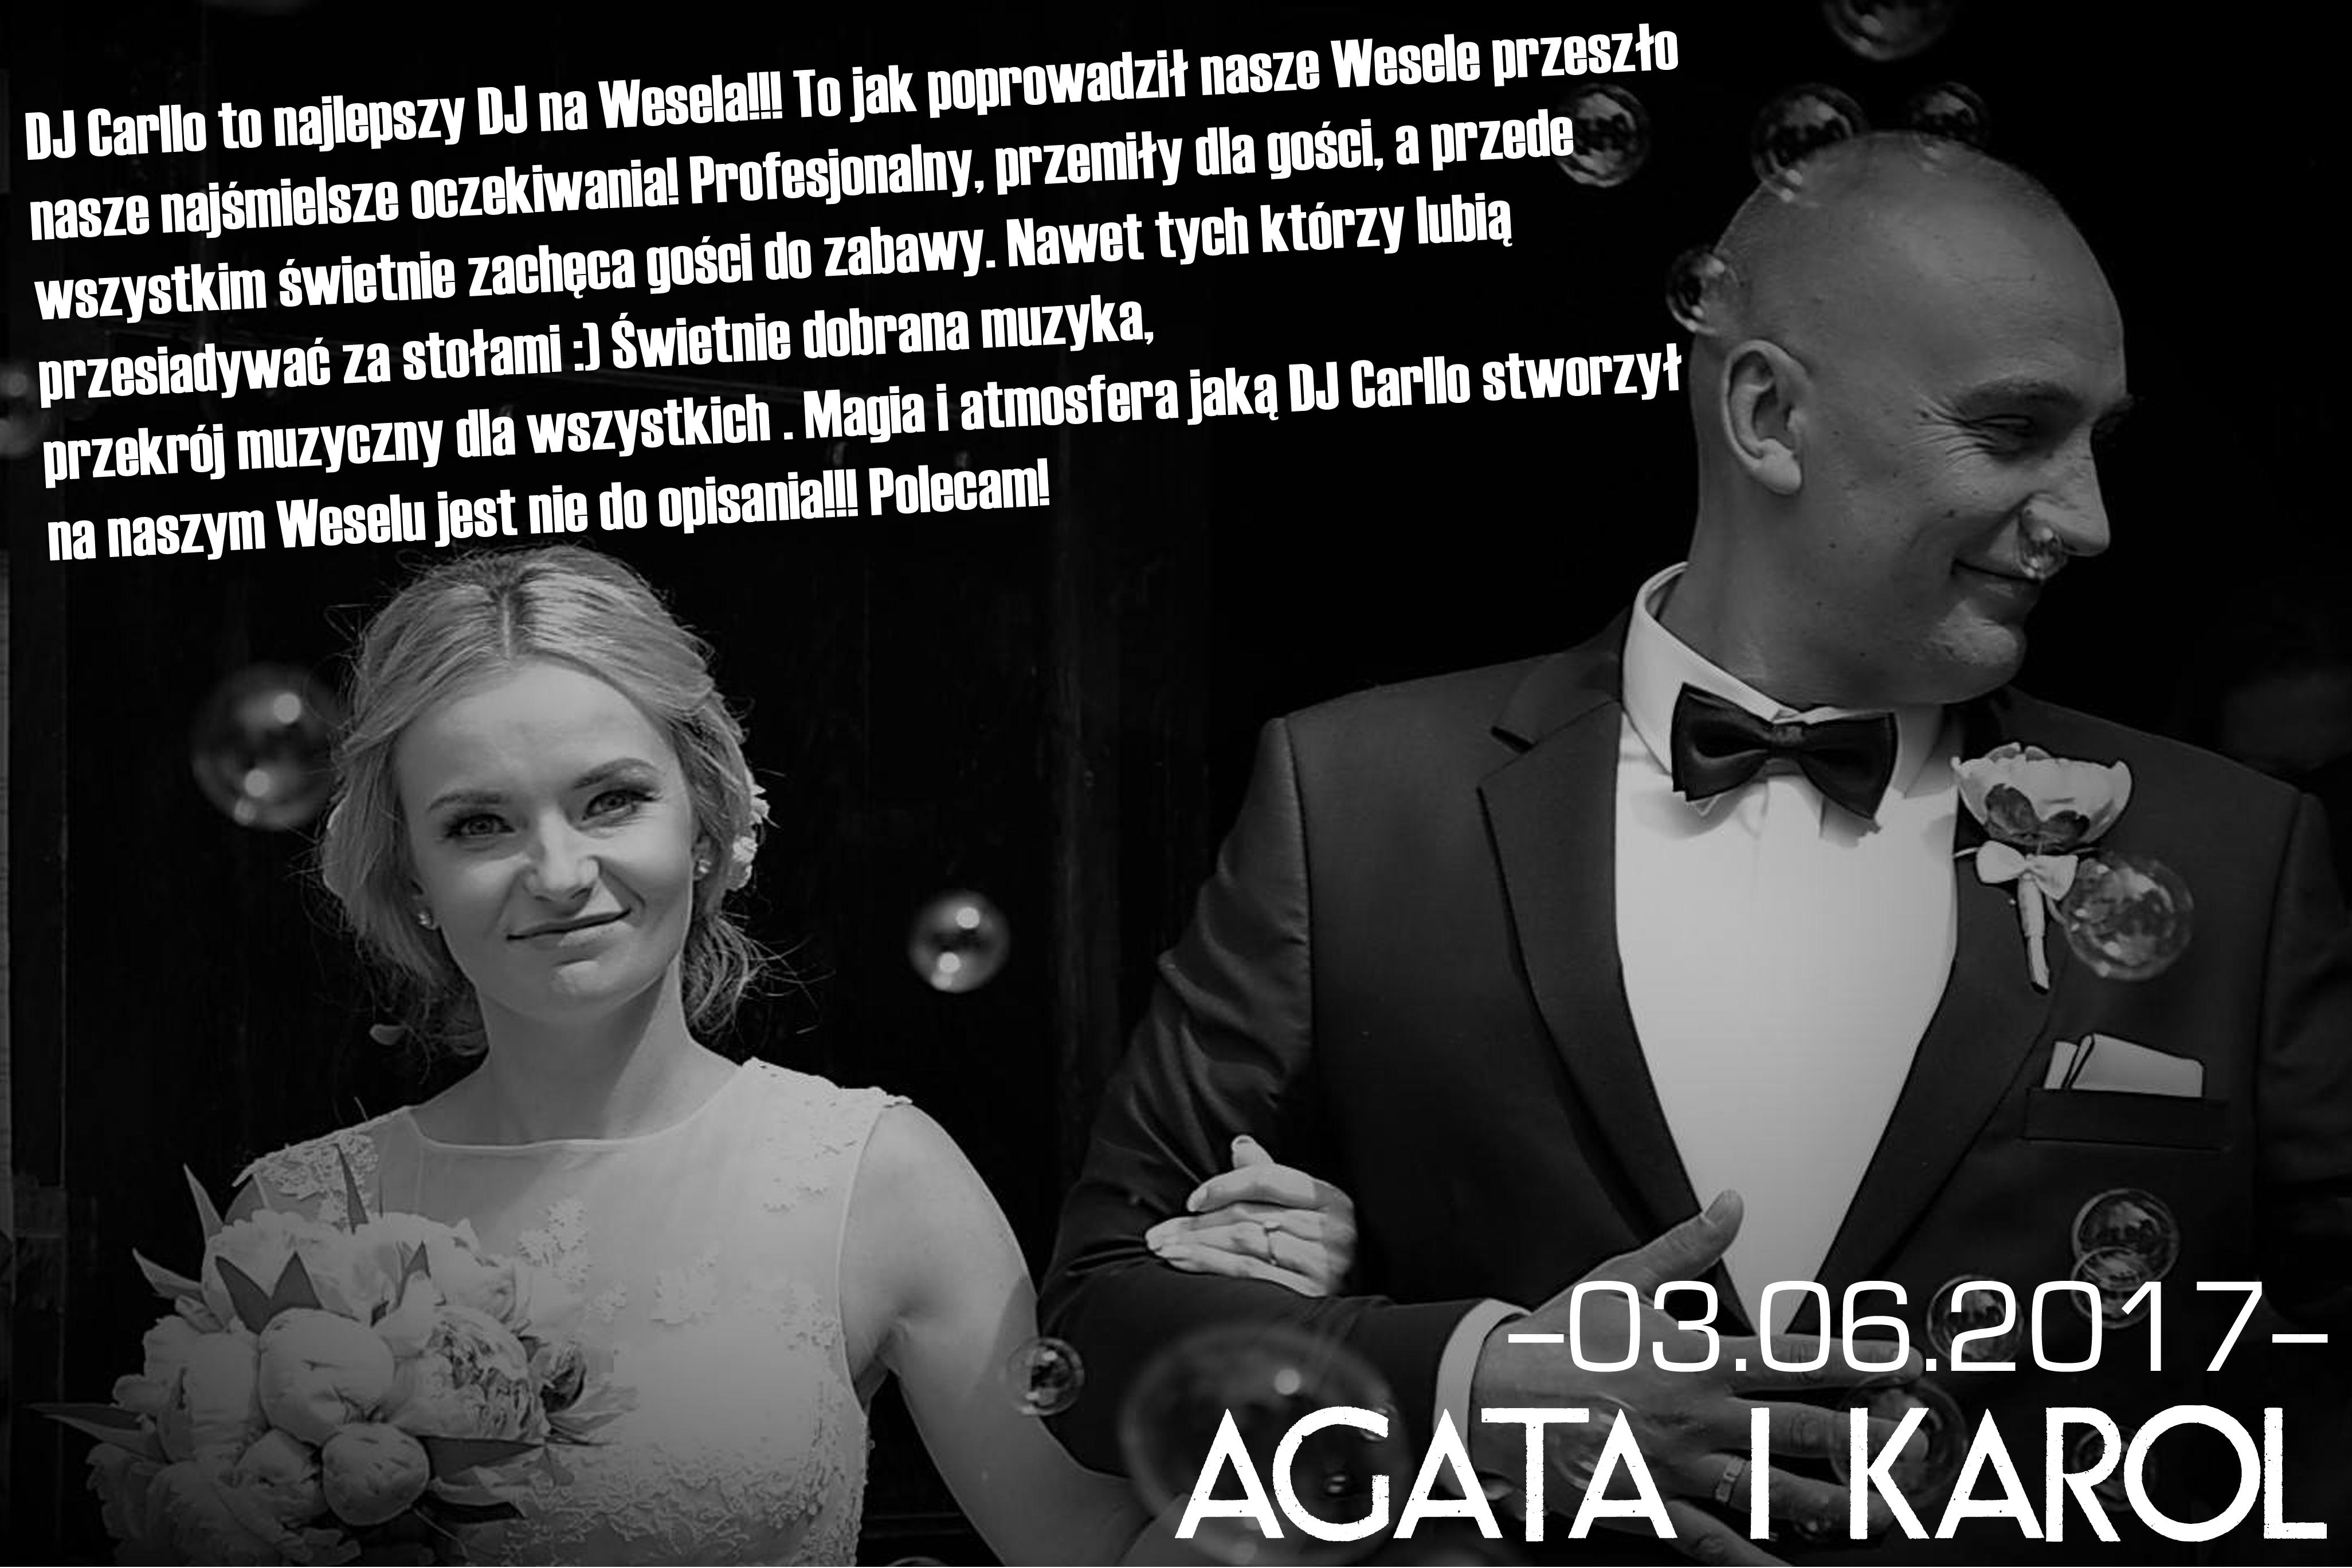 AGATA & KAROL